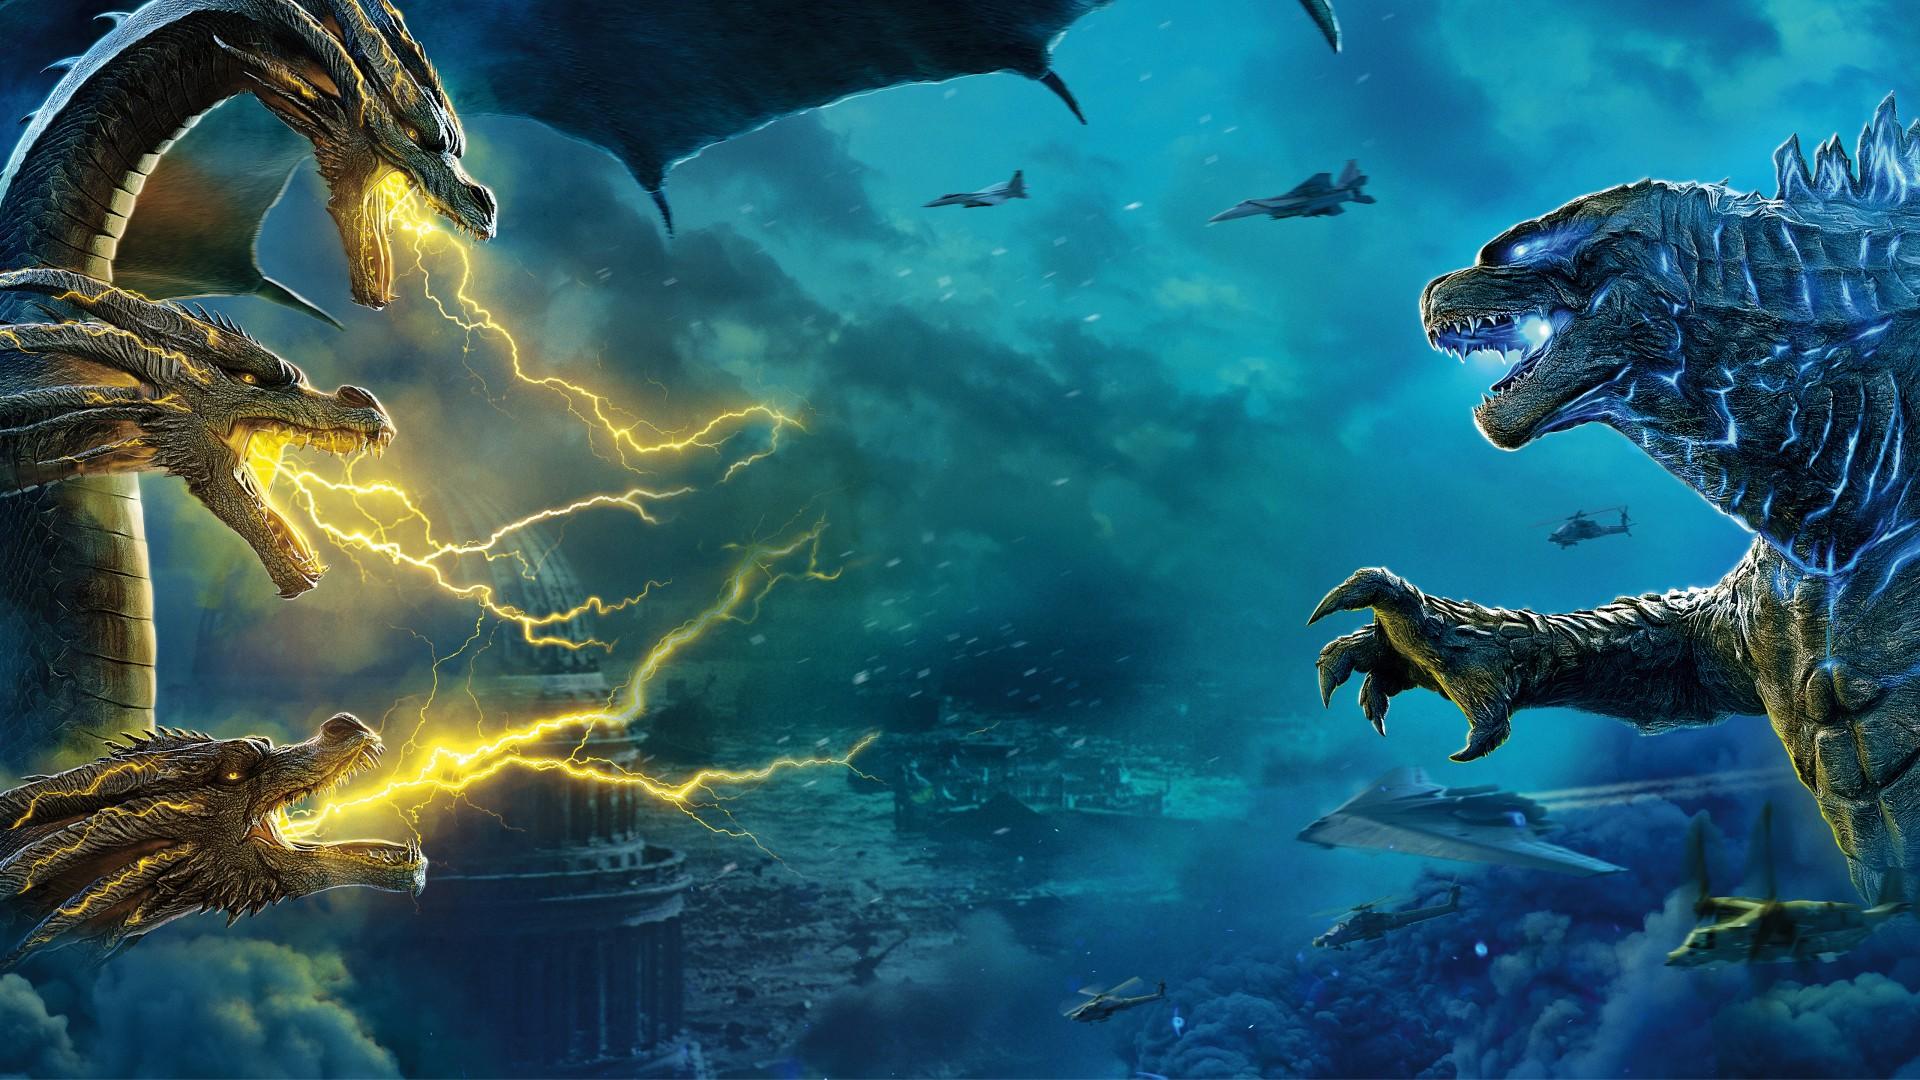 Wallpaper Harry Potter Iphone Godzilla Vs King Ghidorah 5k Wallpapers Hd Wallpapers